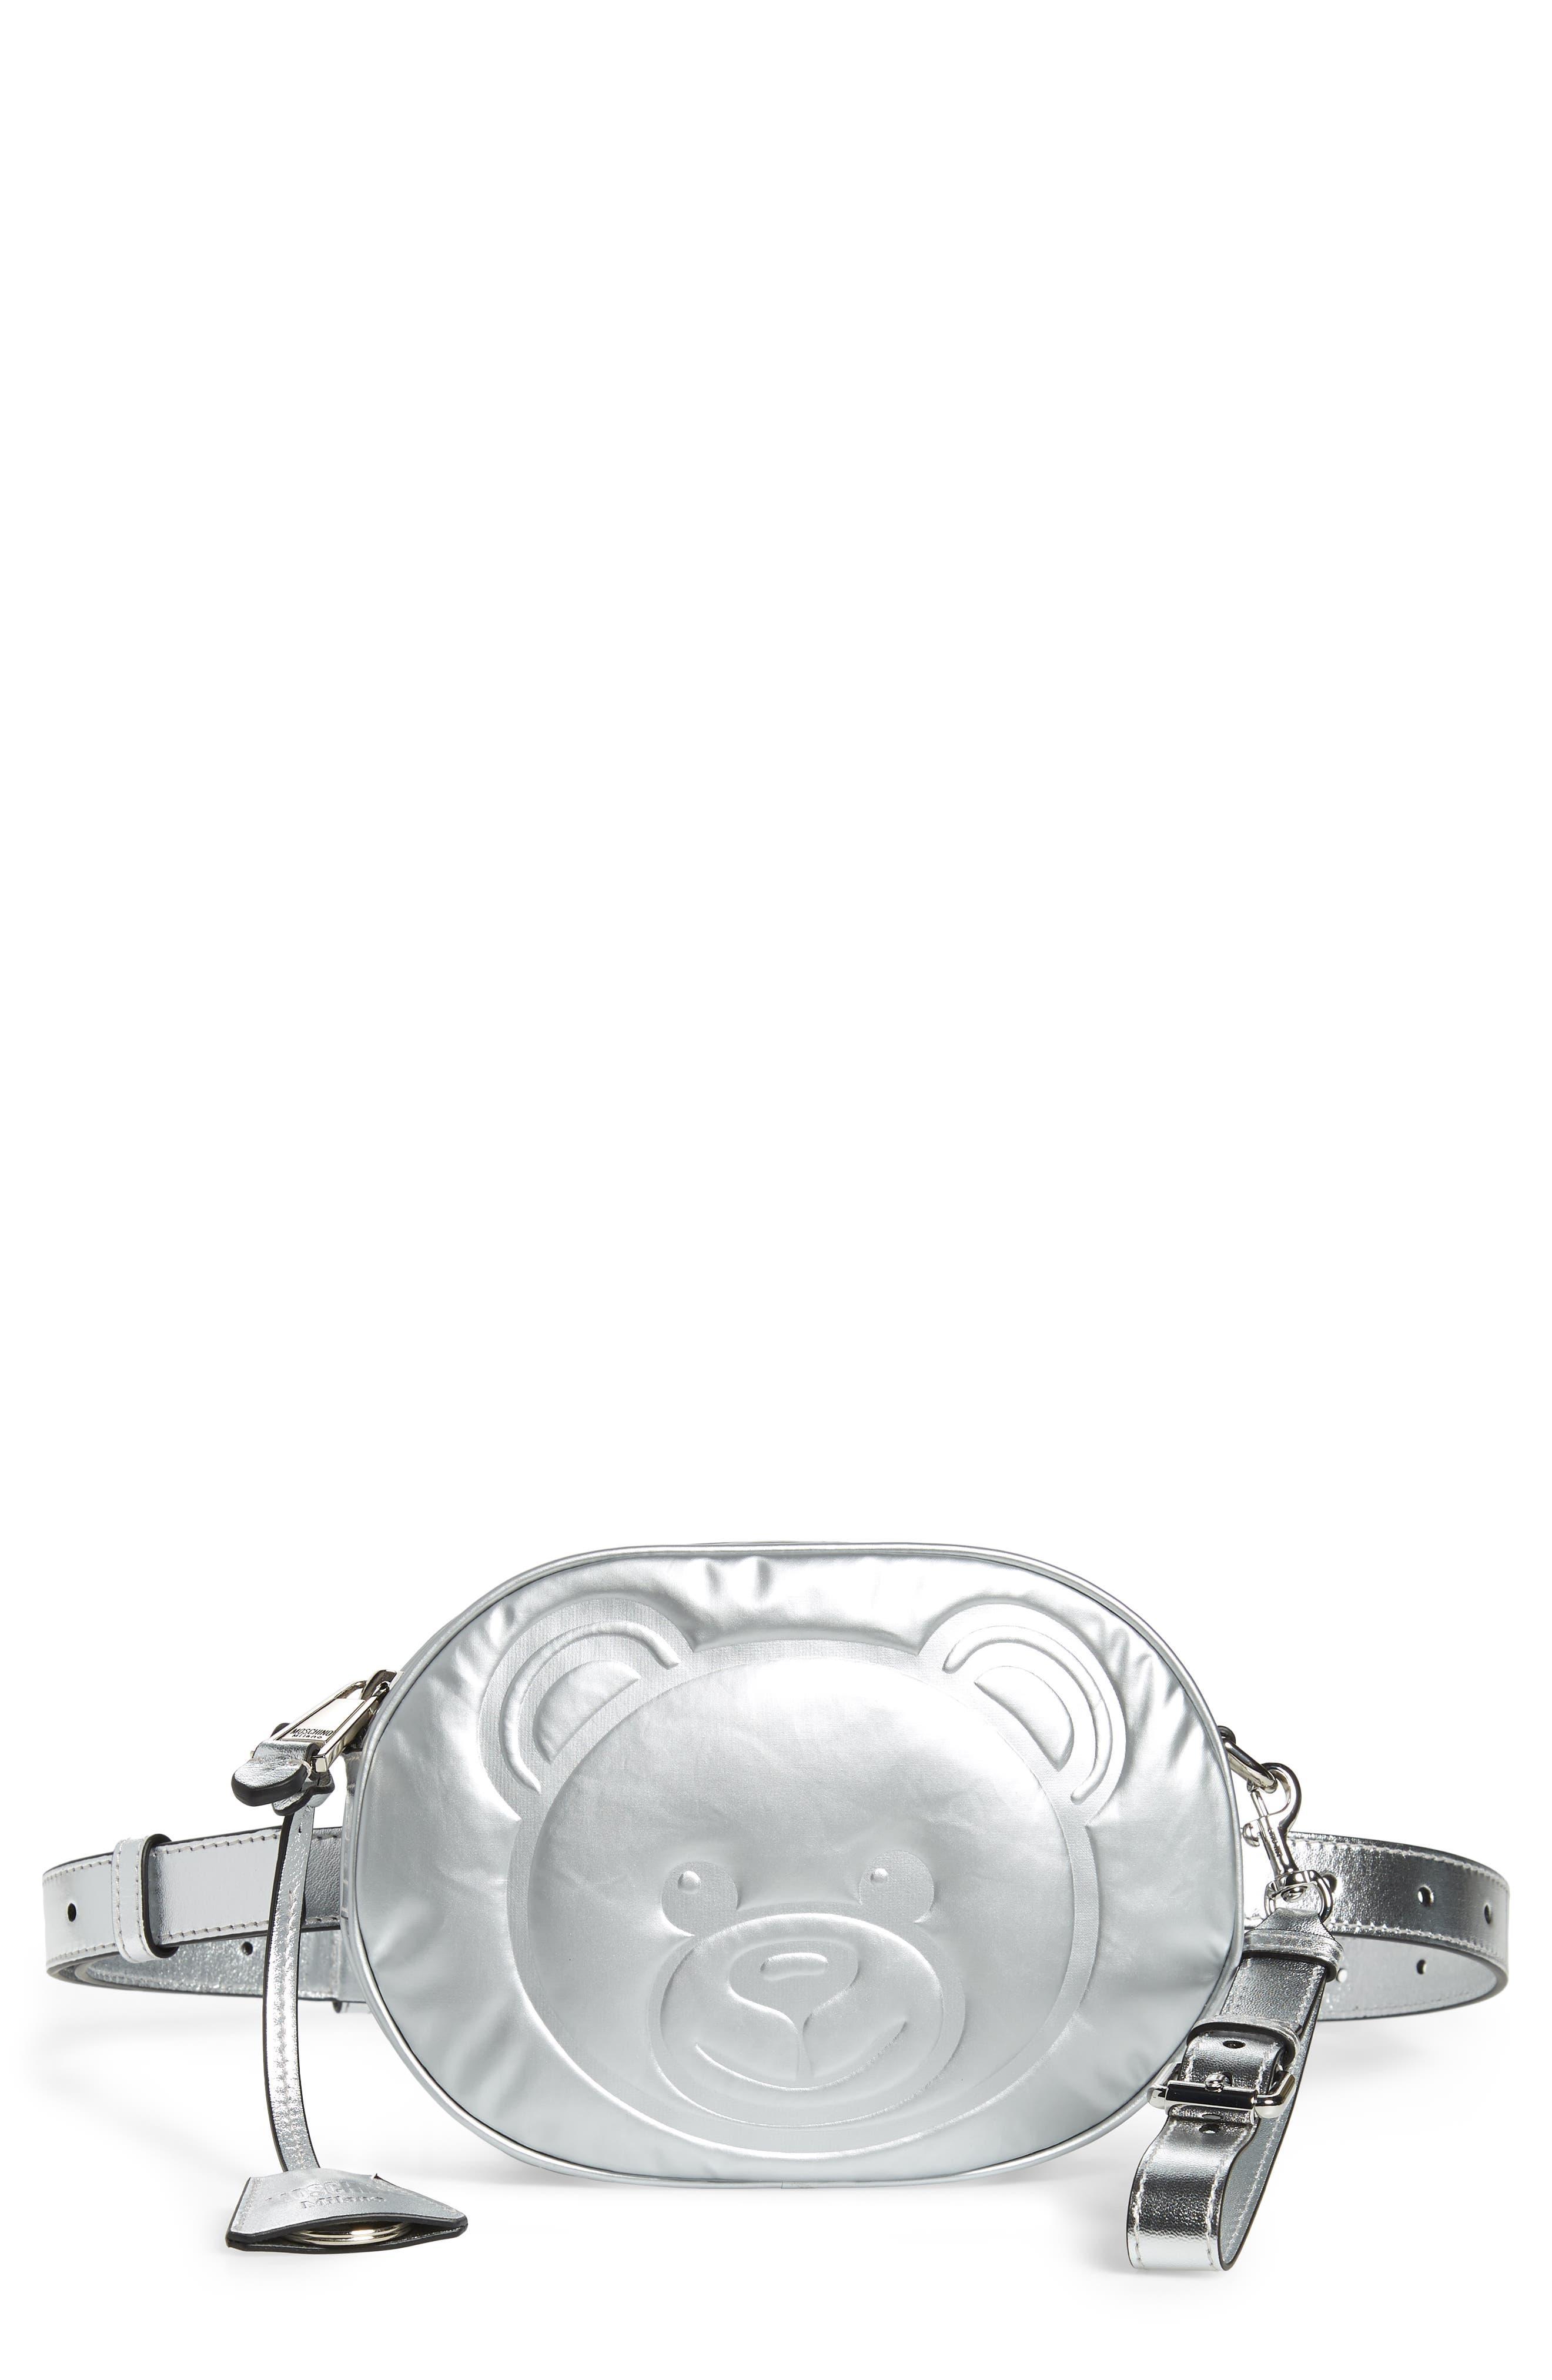 MOSCHINO, Silver Teddy Belt Bag, Main thumbnail 1, color, SILVER